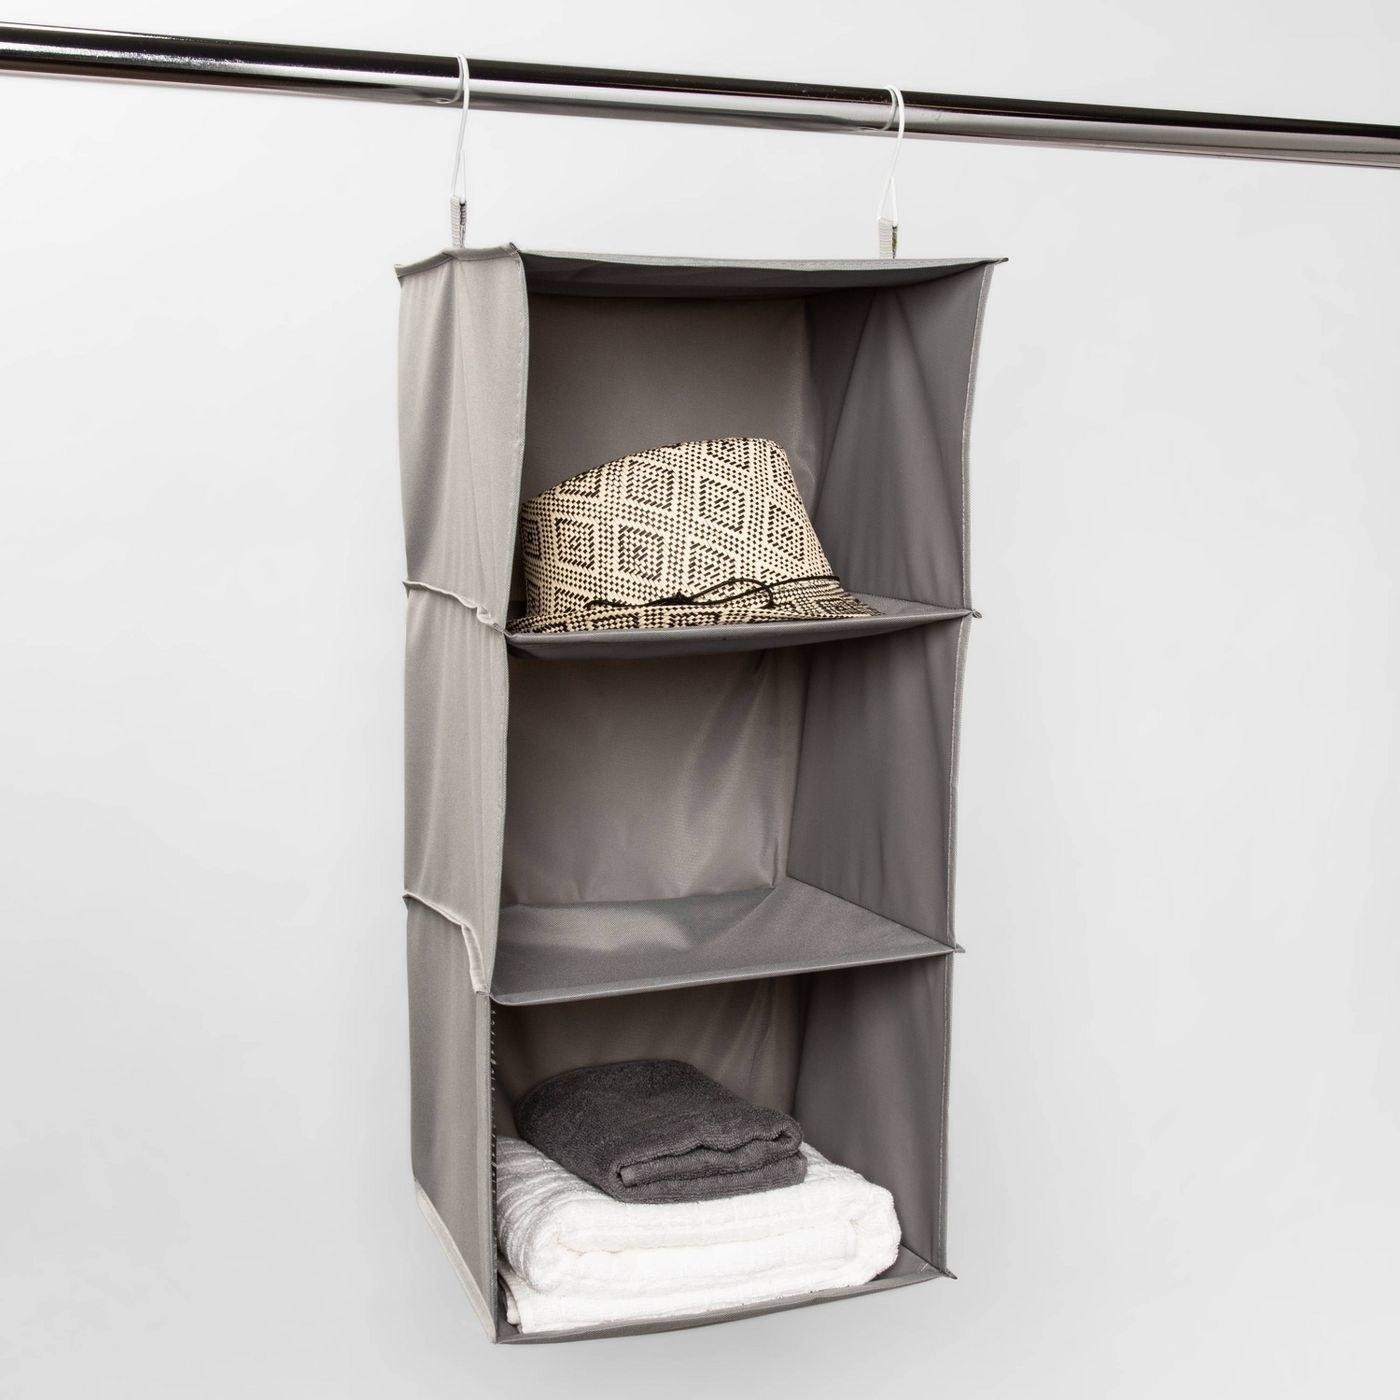 Gray hanging three-compartment shelf organizer